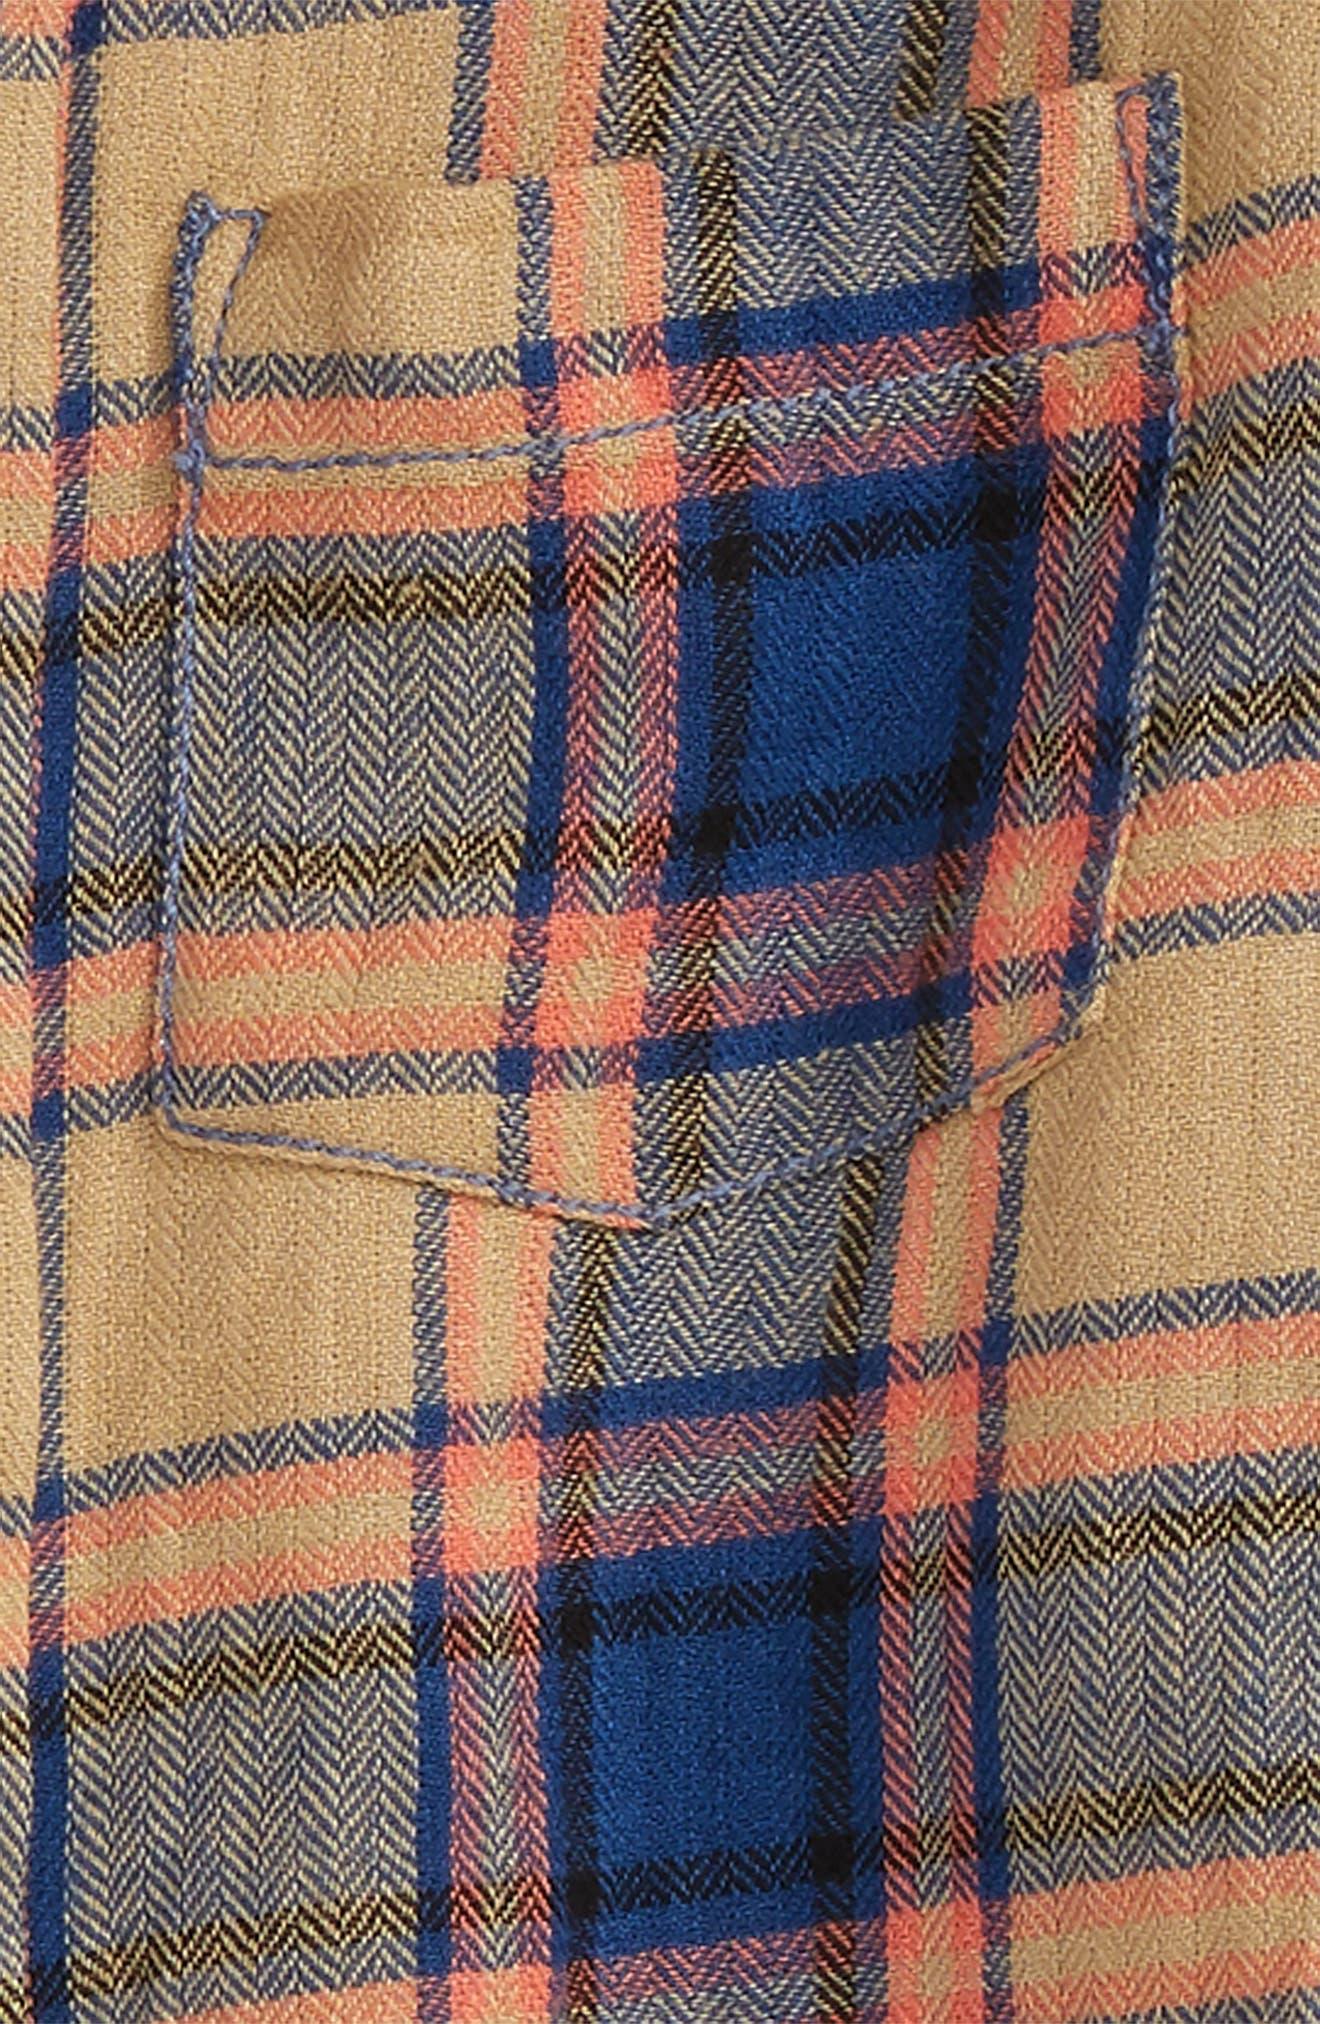 Alternate Image 2  - Peek Henry Plaid Woven Shirt (Toddler Boys, Little Boys & Big Boys)